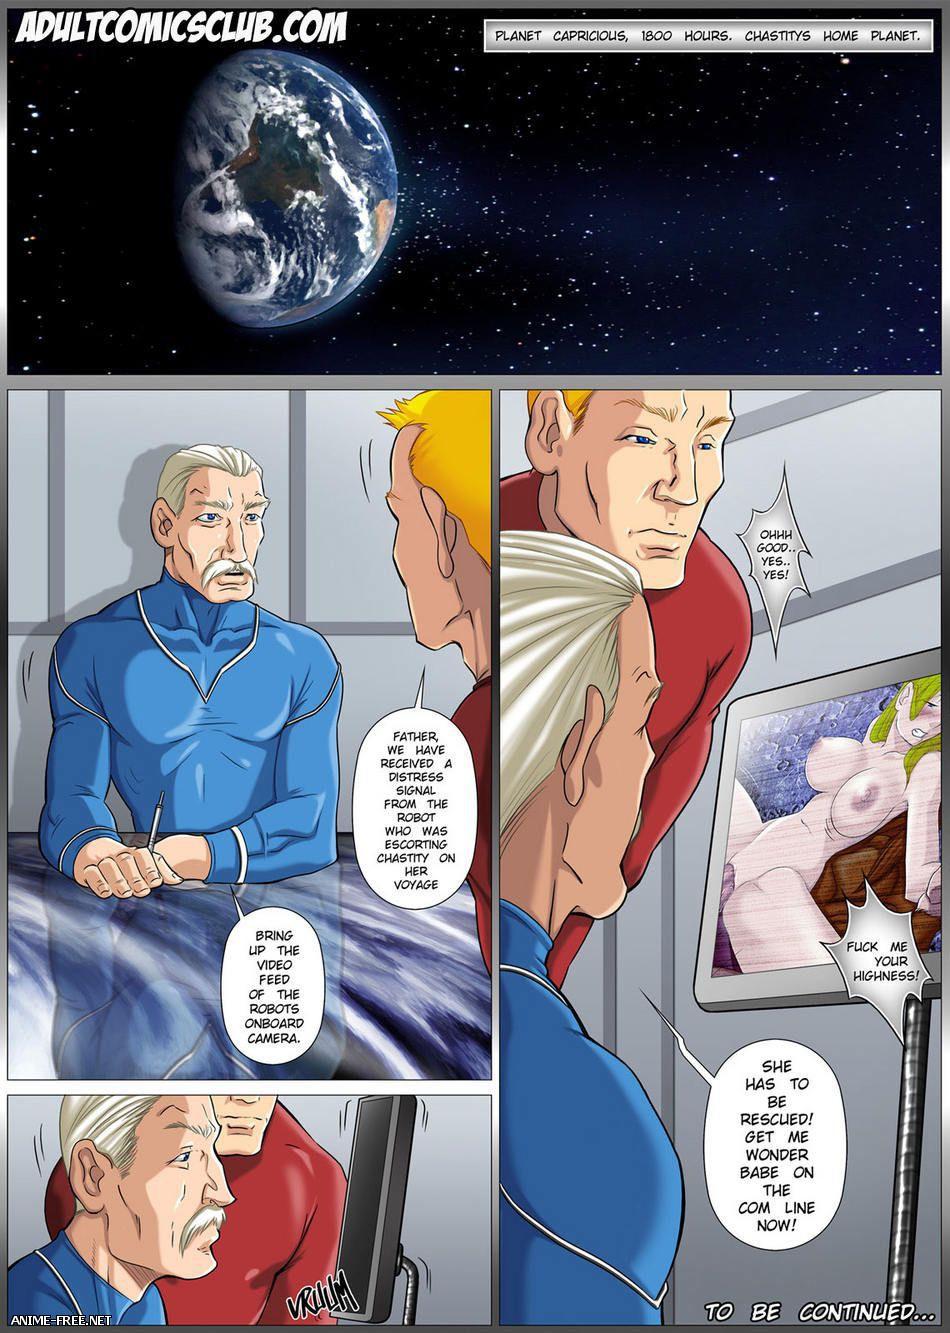 MelkorMancin - Romulo Melkor Mancin / Сборник комиксов от Ромуло Манцин [Uncen] [RUS,ENG,Multi8] Porno Comics